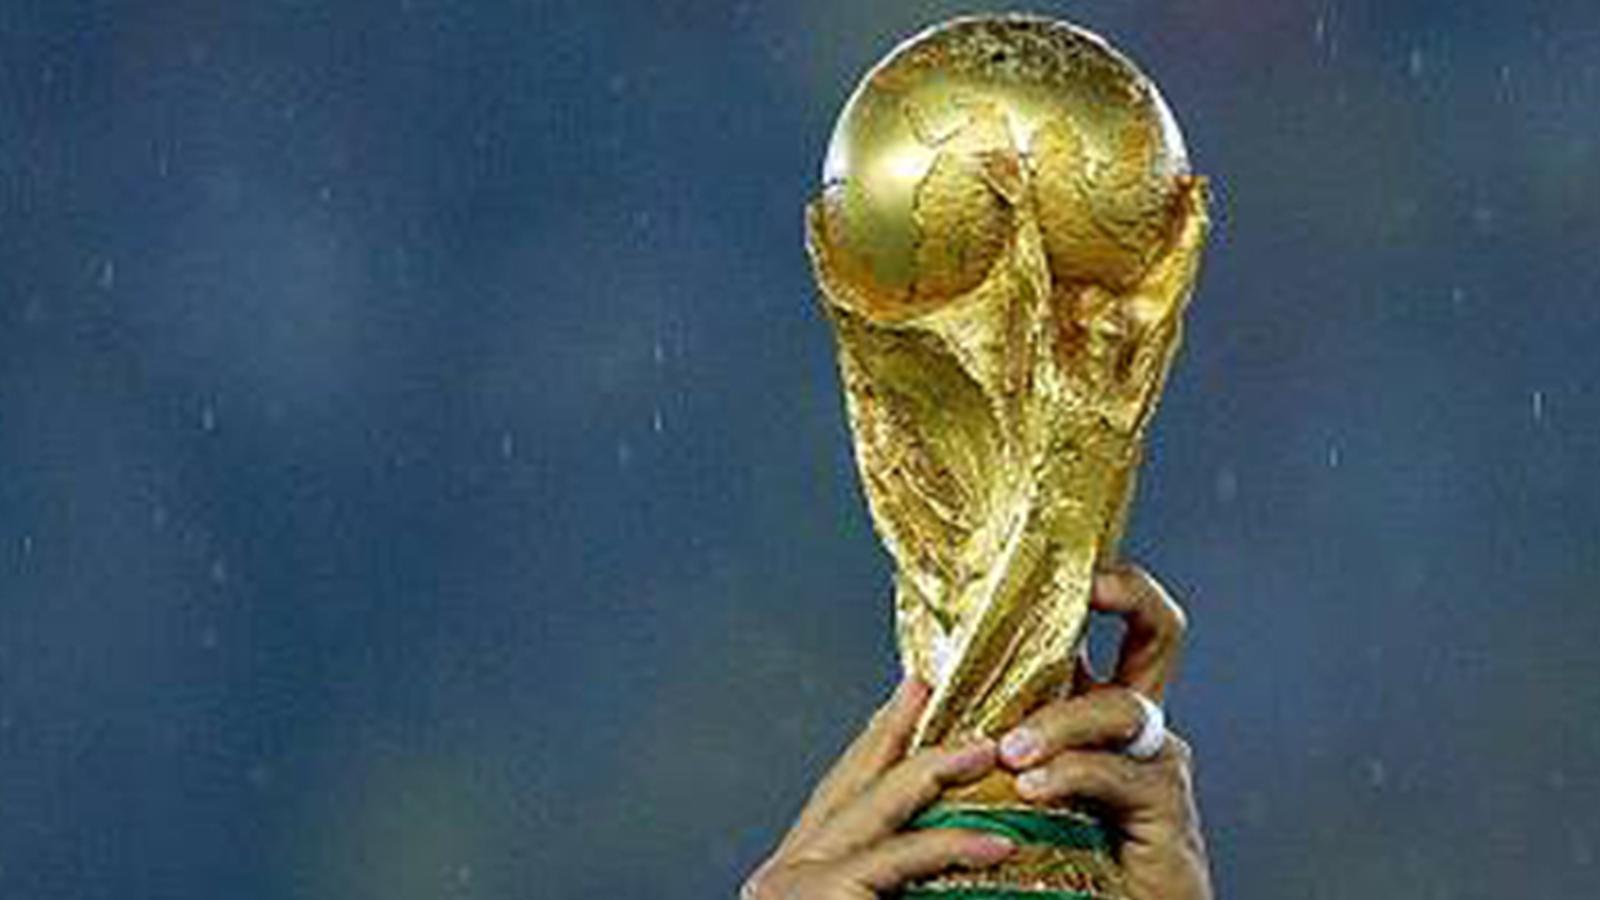 Palmar s coupe du monde 2006 football eurosport - Coupe du monde de foot 2006 ...